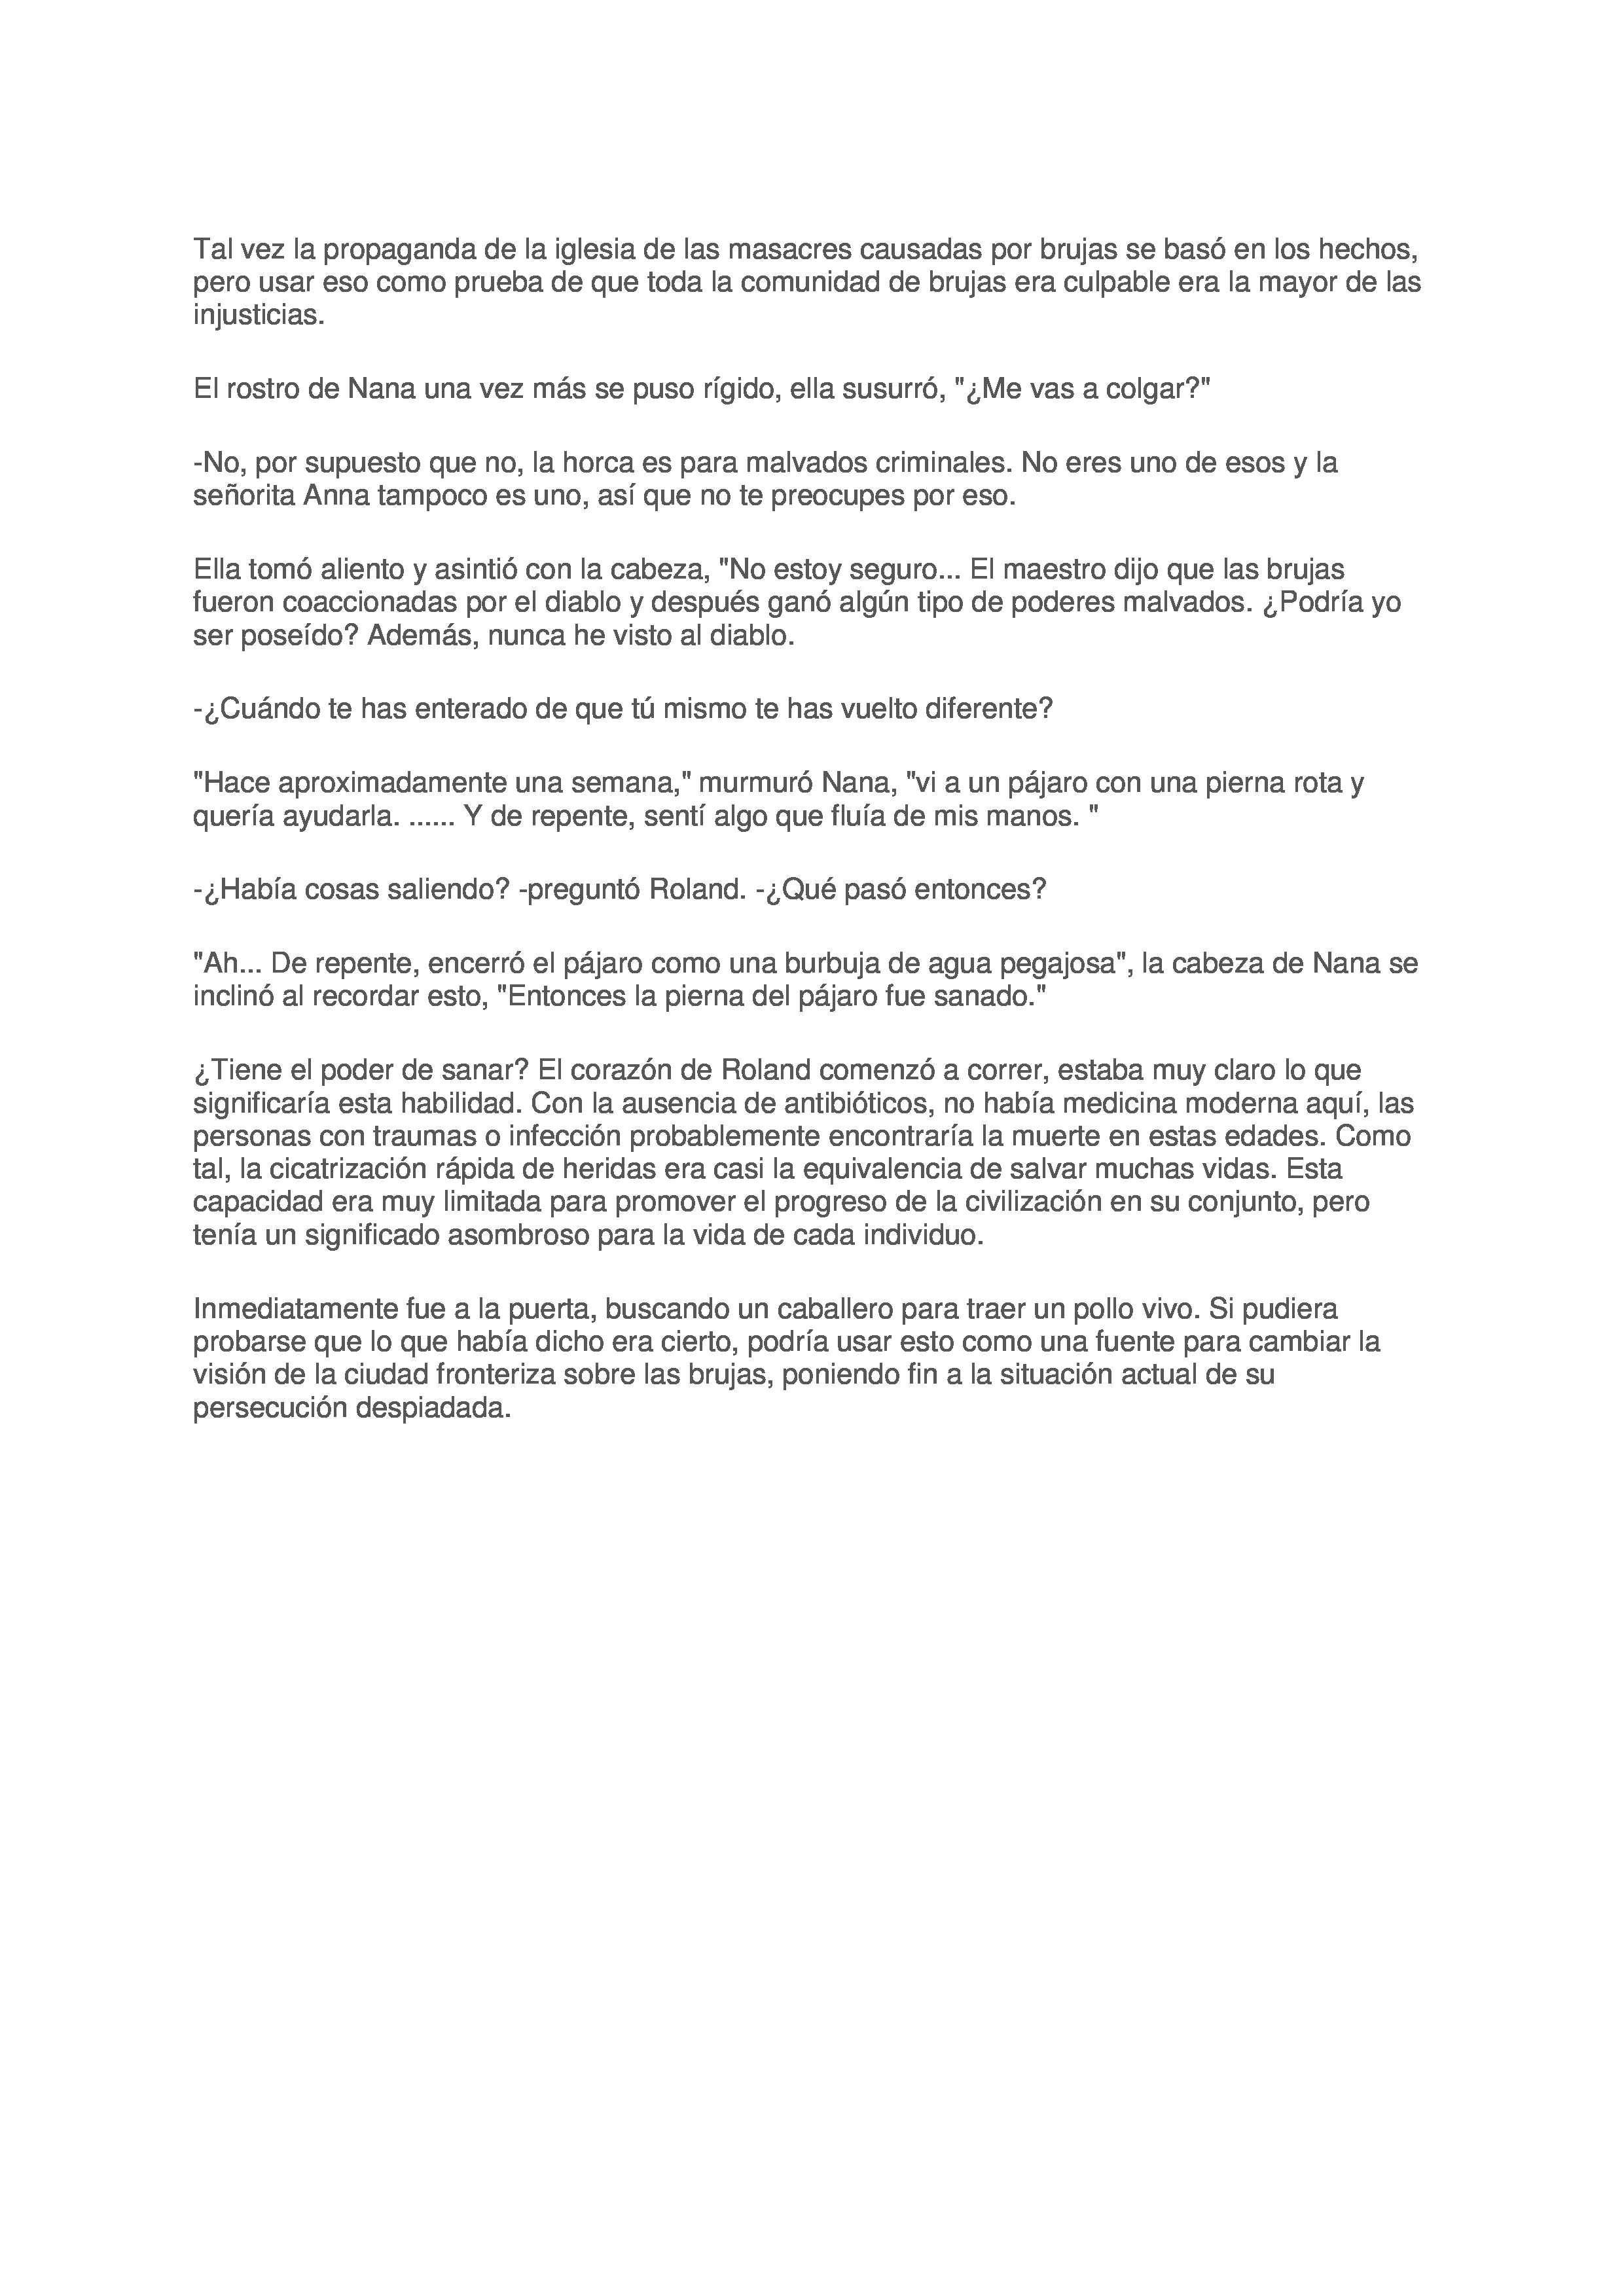 https://c5.ninemanga.com/es_manga/pic2/12/21196/518563/127417dfbda8ba627d66c0dae4aef409.jpg Page 3